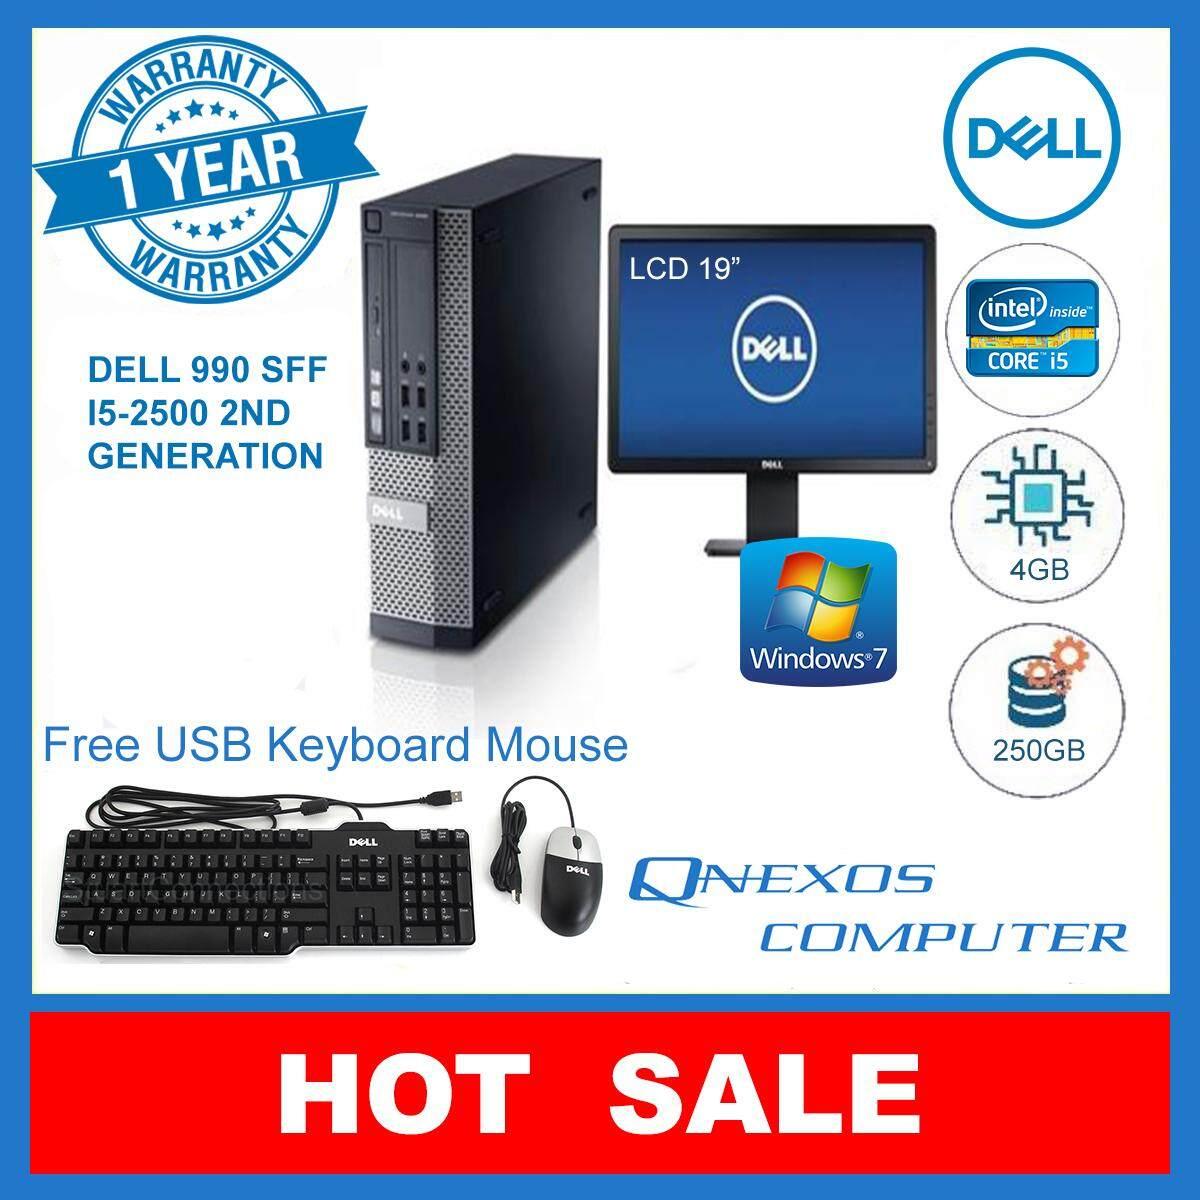 Factory Refurbished Dell Optiplex 990 Sff Intel Core I5 310 Ghz Keyboard Mouse Usb 4gb Ddr3 Ram 500 Gb Hdd Dvd Rom Window 7 19 Inch Widescreen Lcd Monitor Free Gaming Lazada